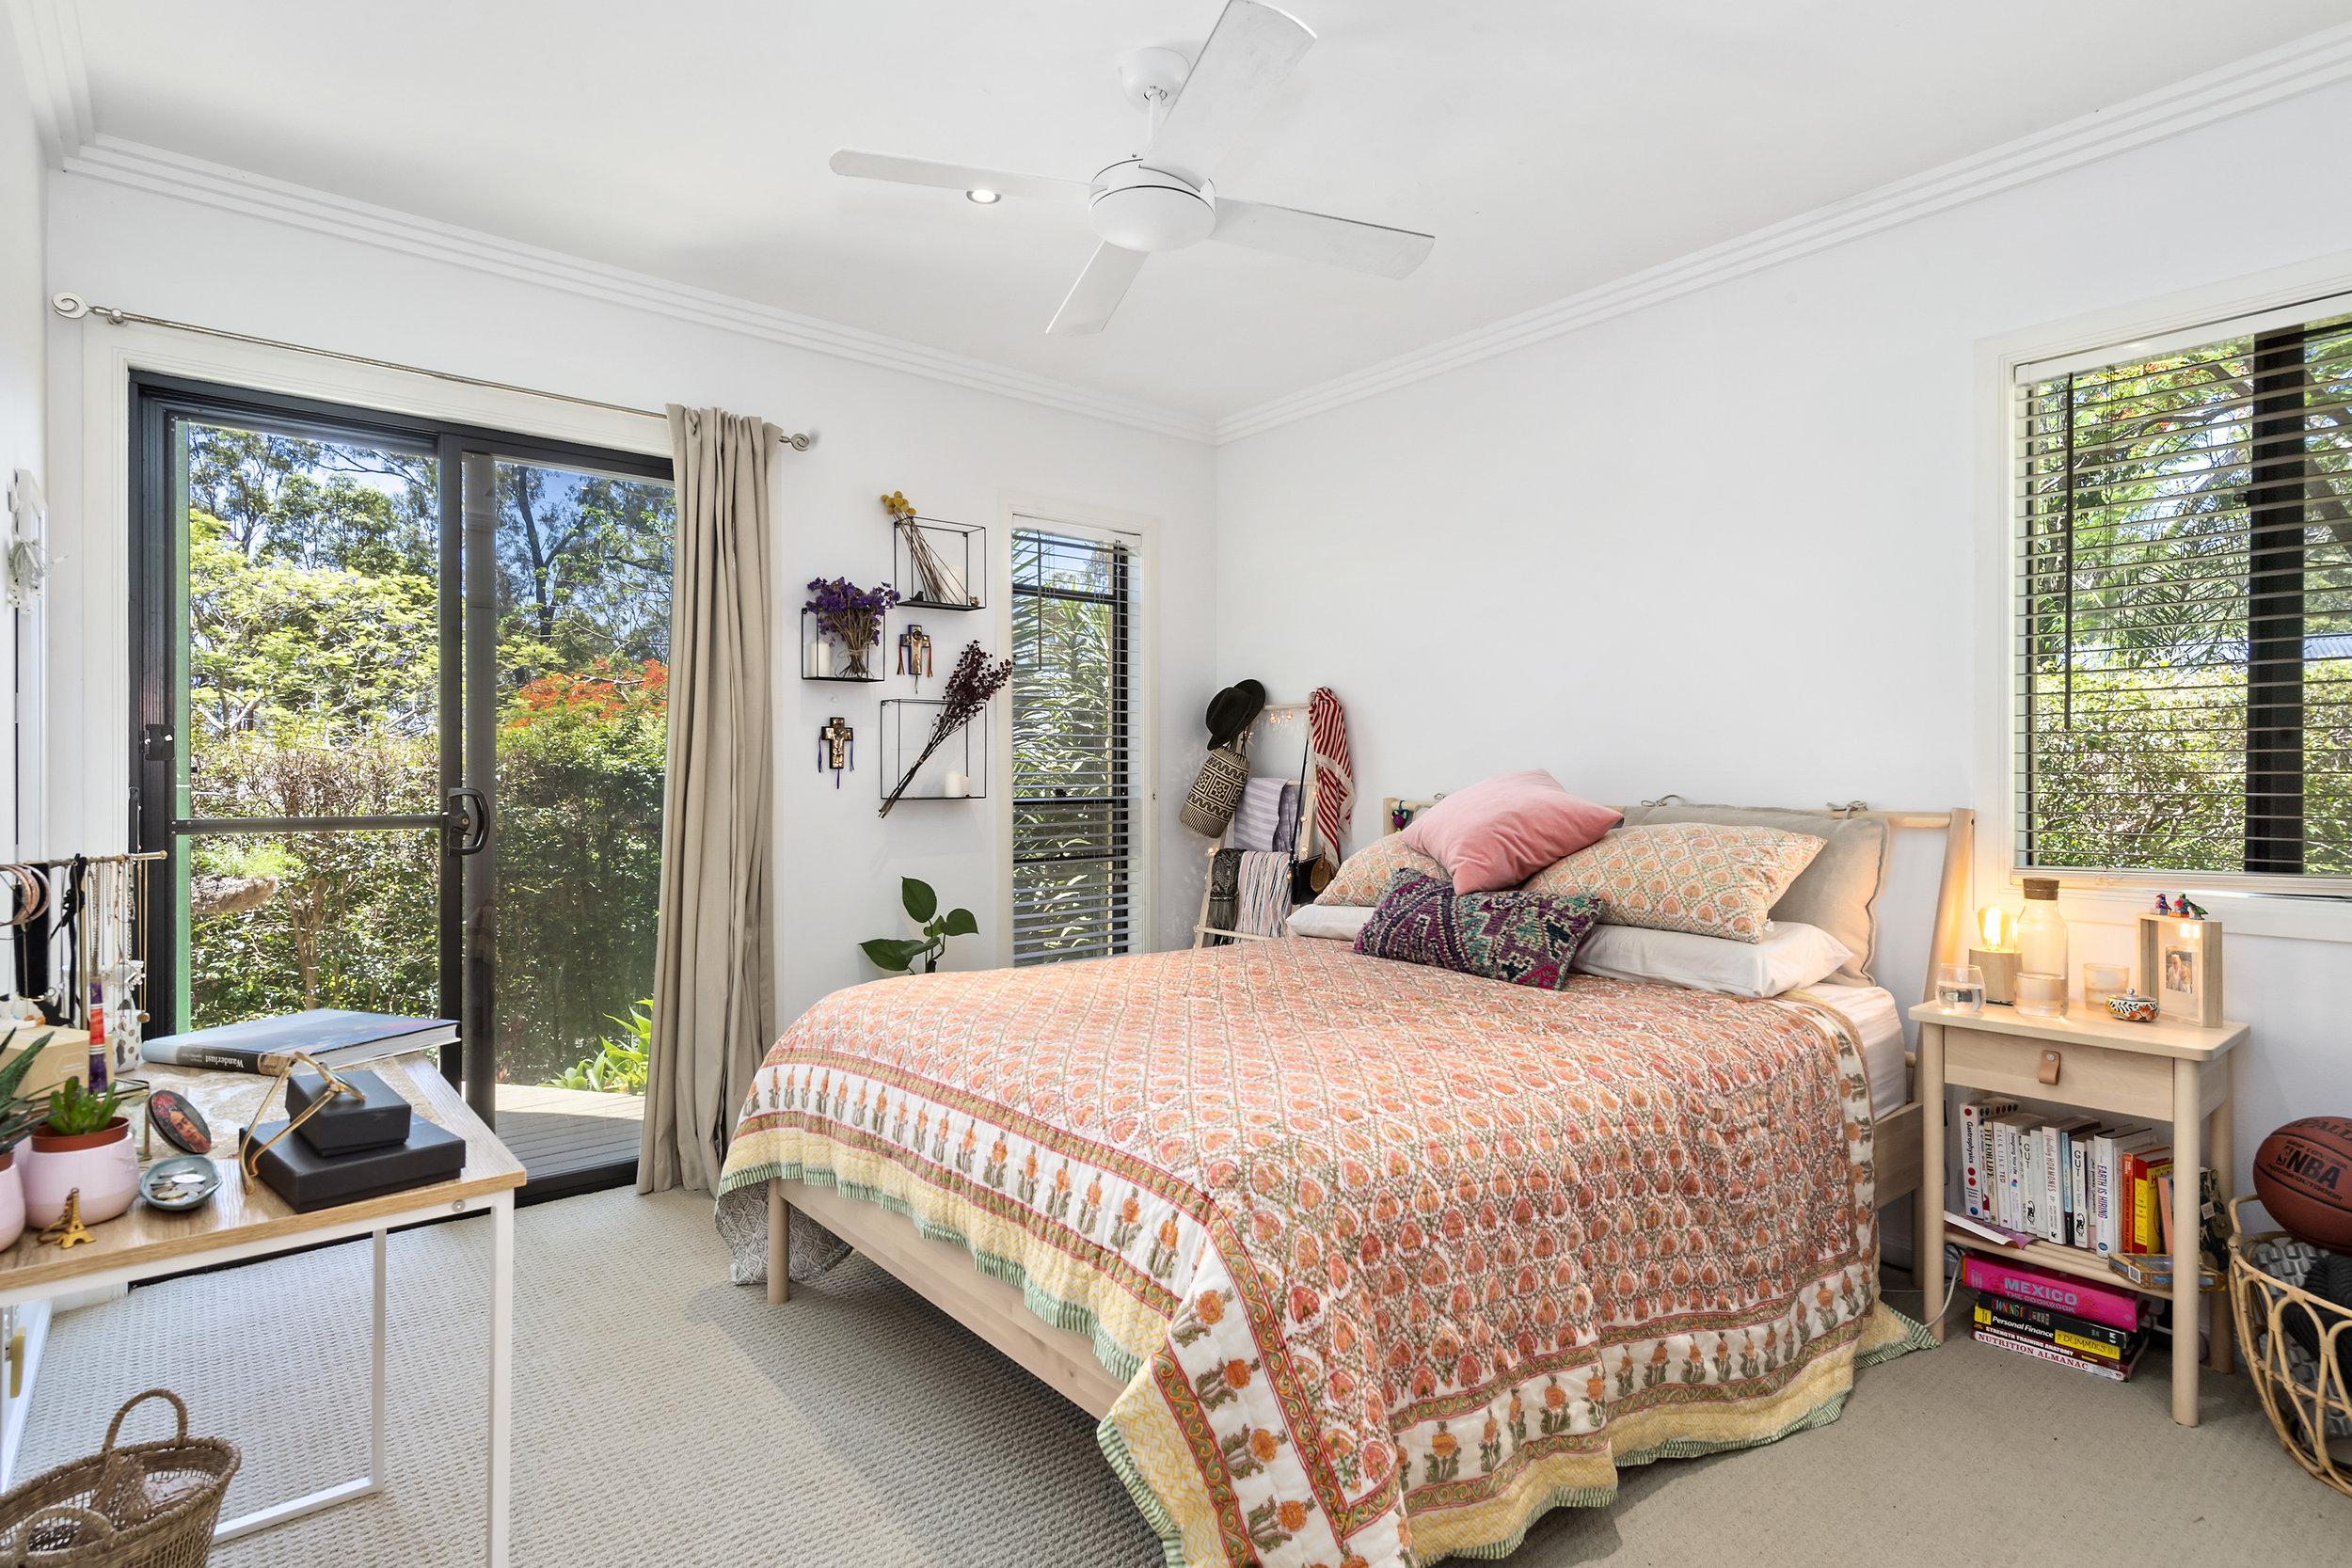 5-Bedroom.jpg